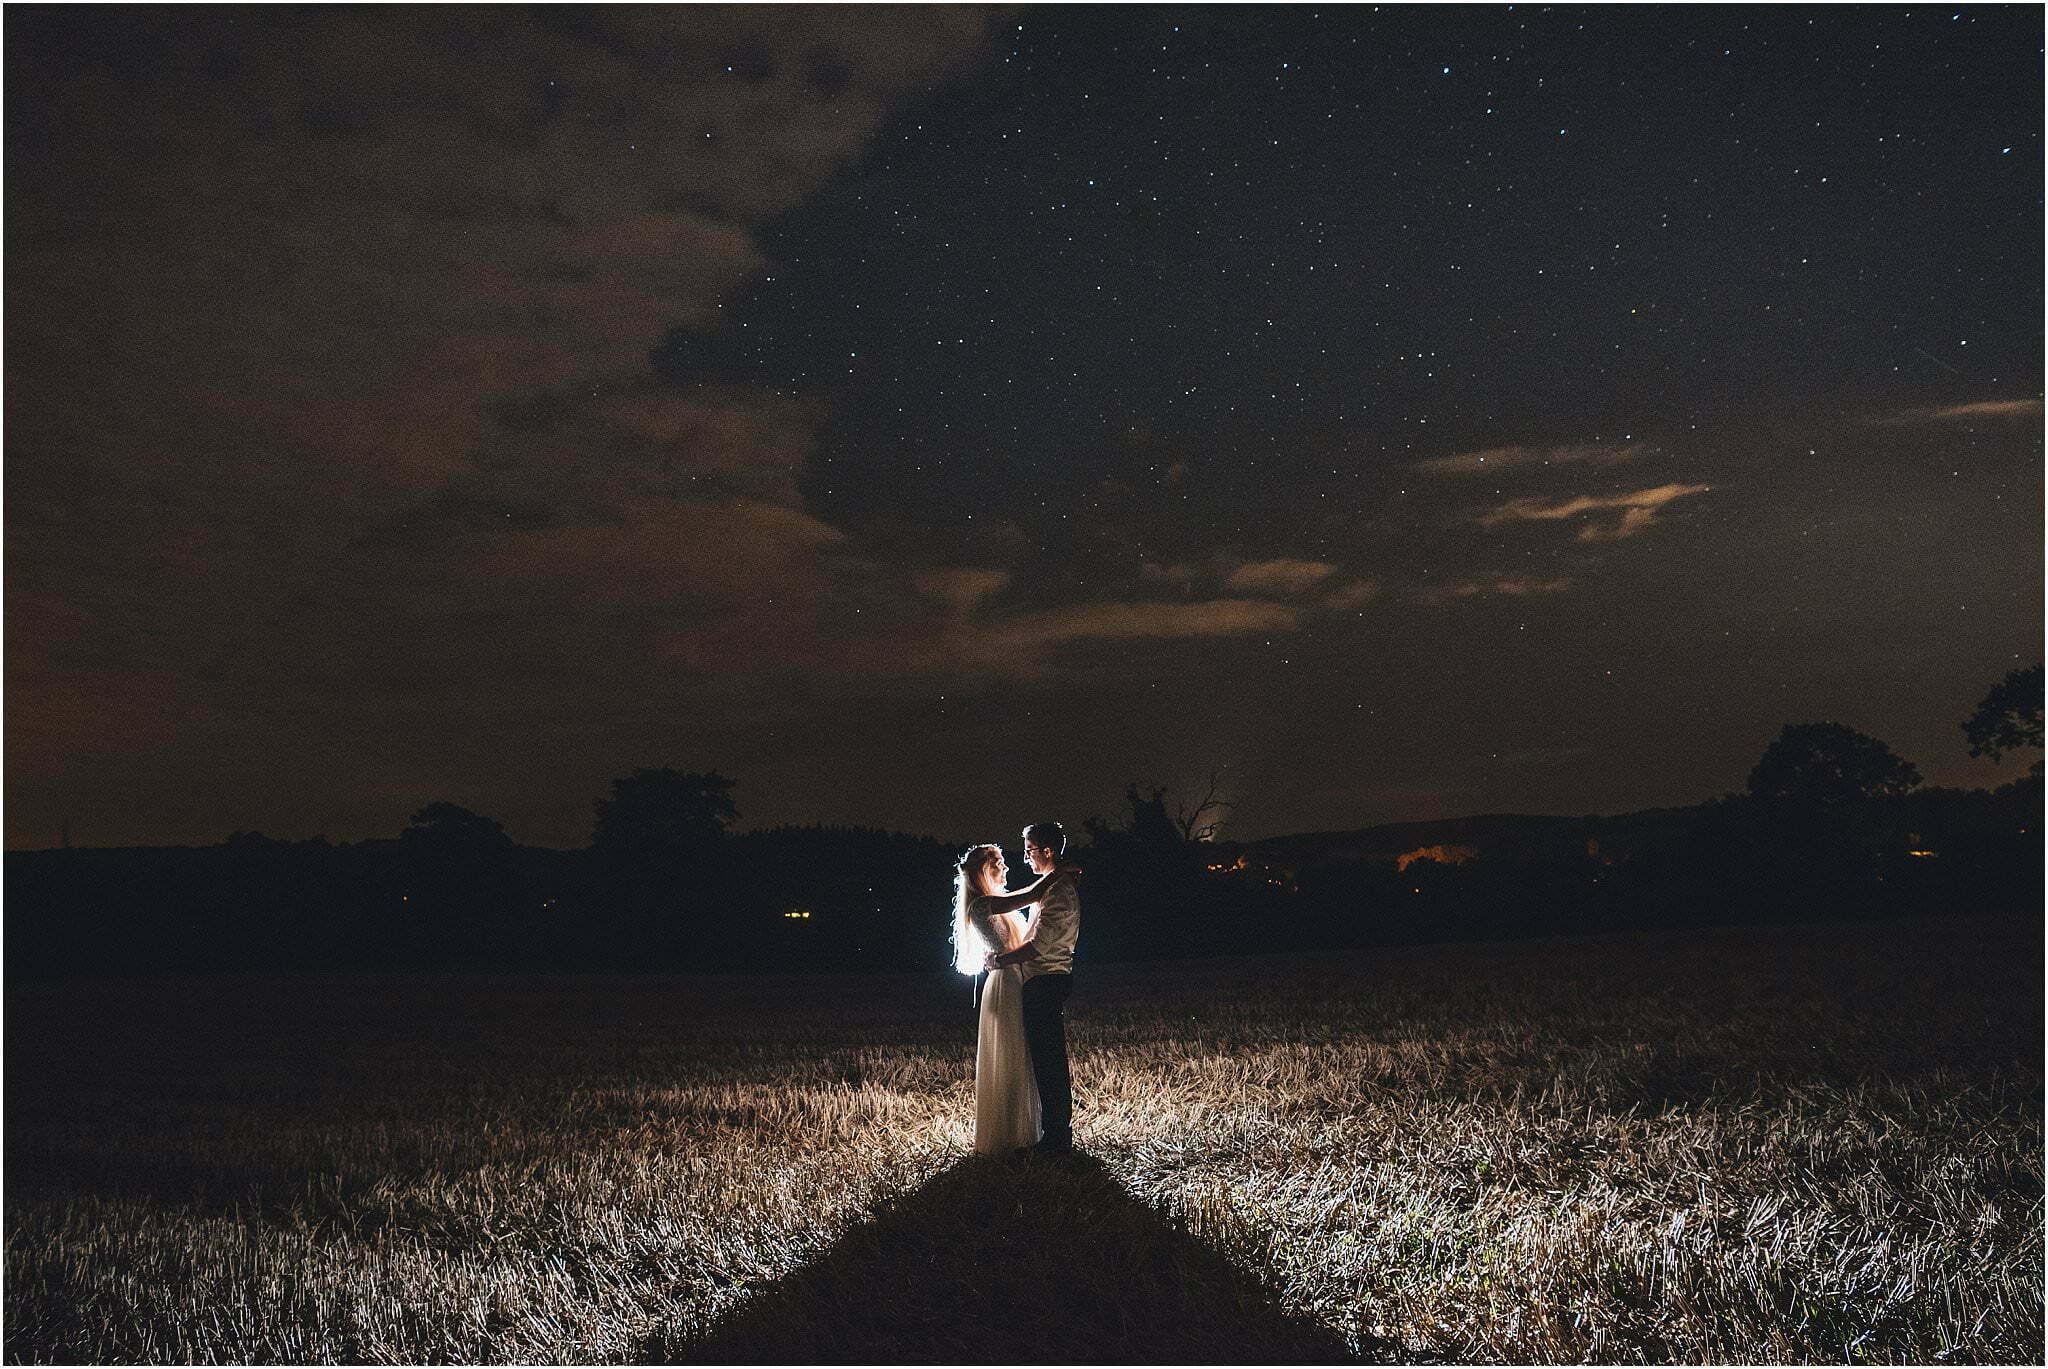 night portrait of bride and groom